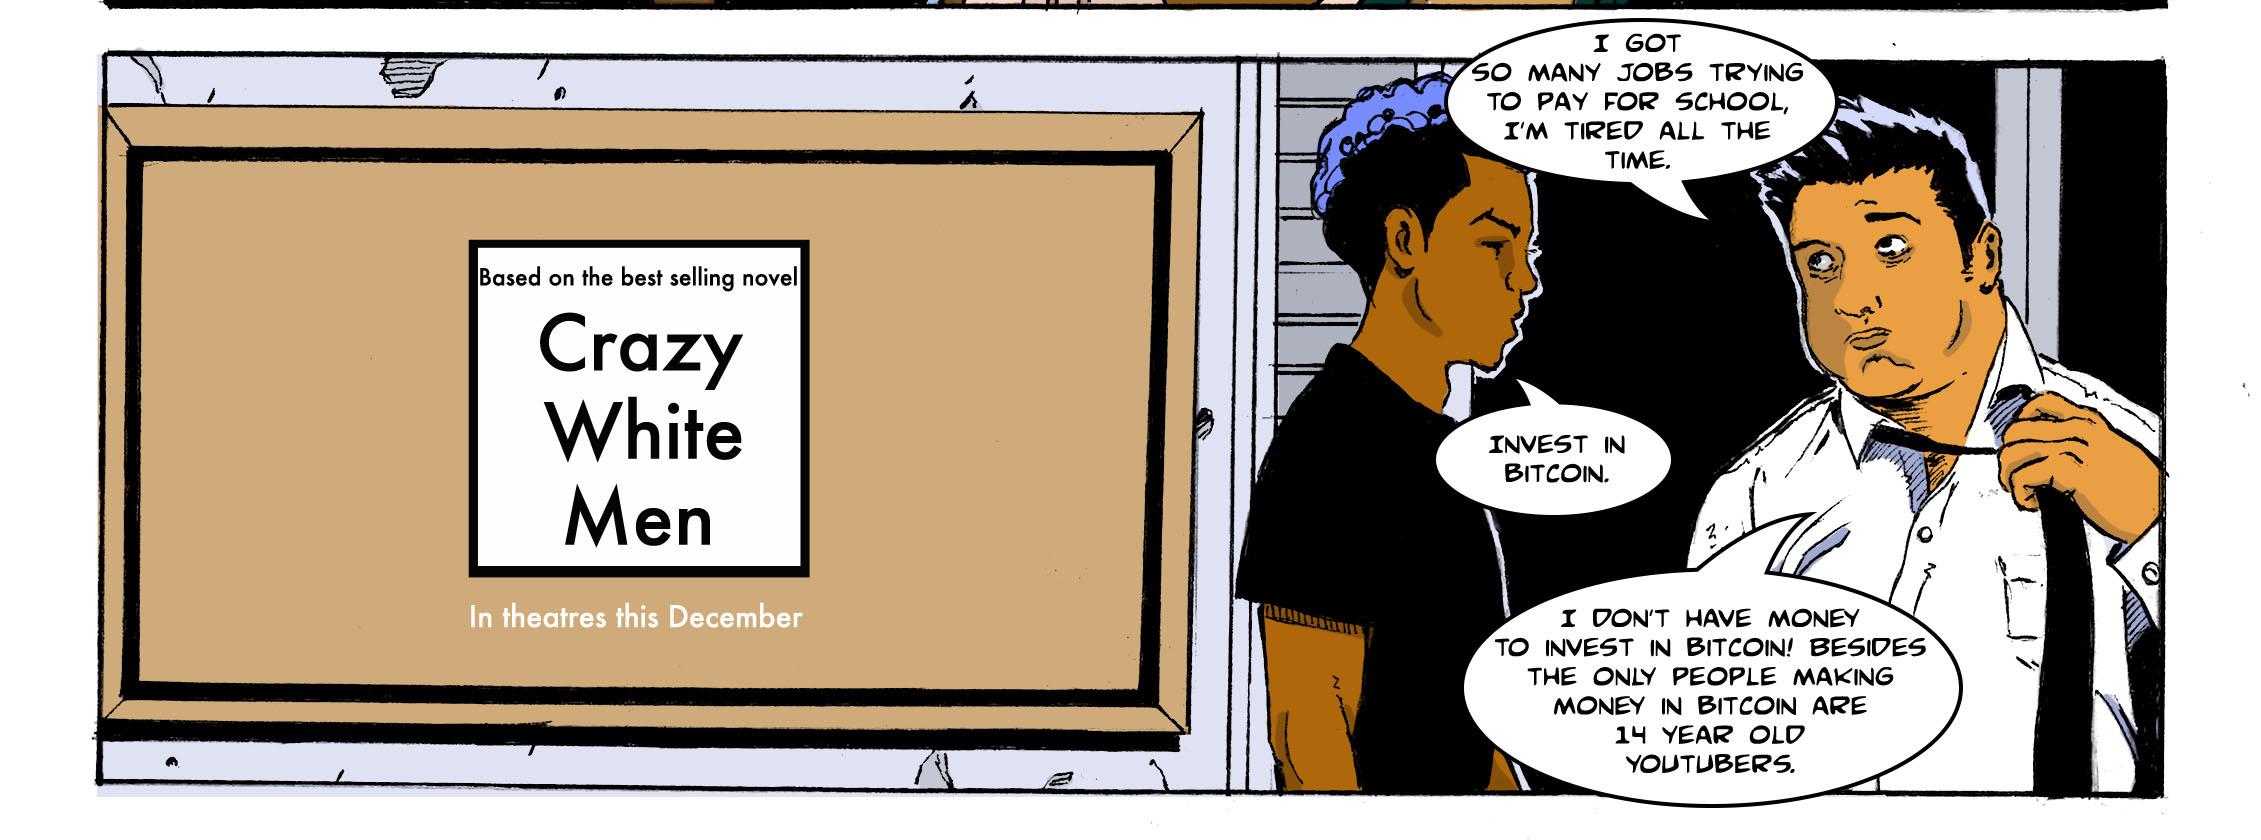 (H) Comic Strip #74 V2.jpg